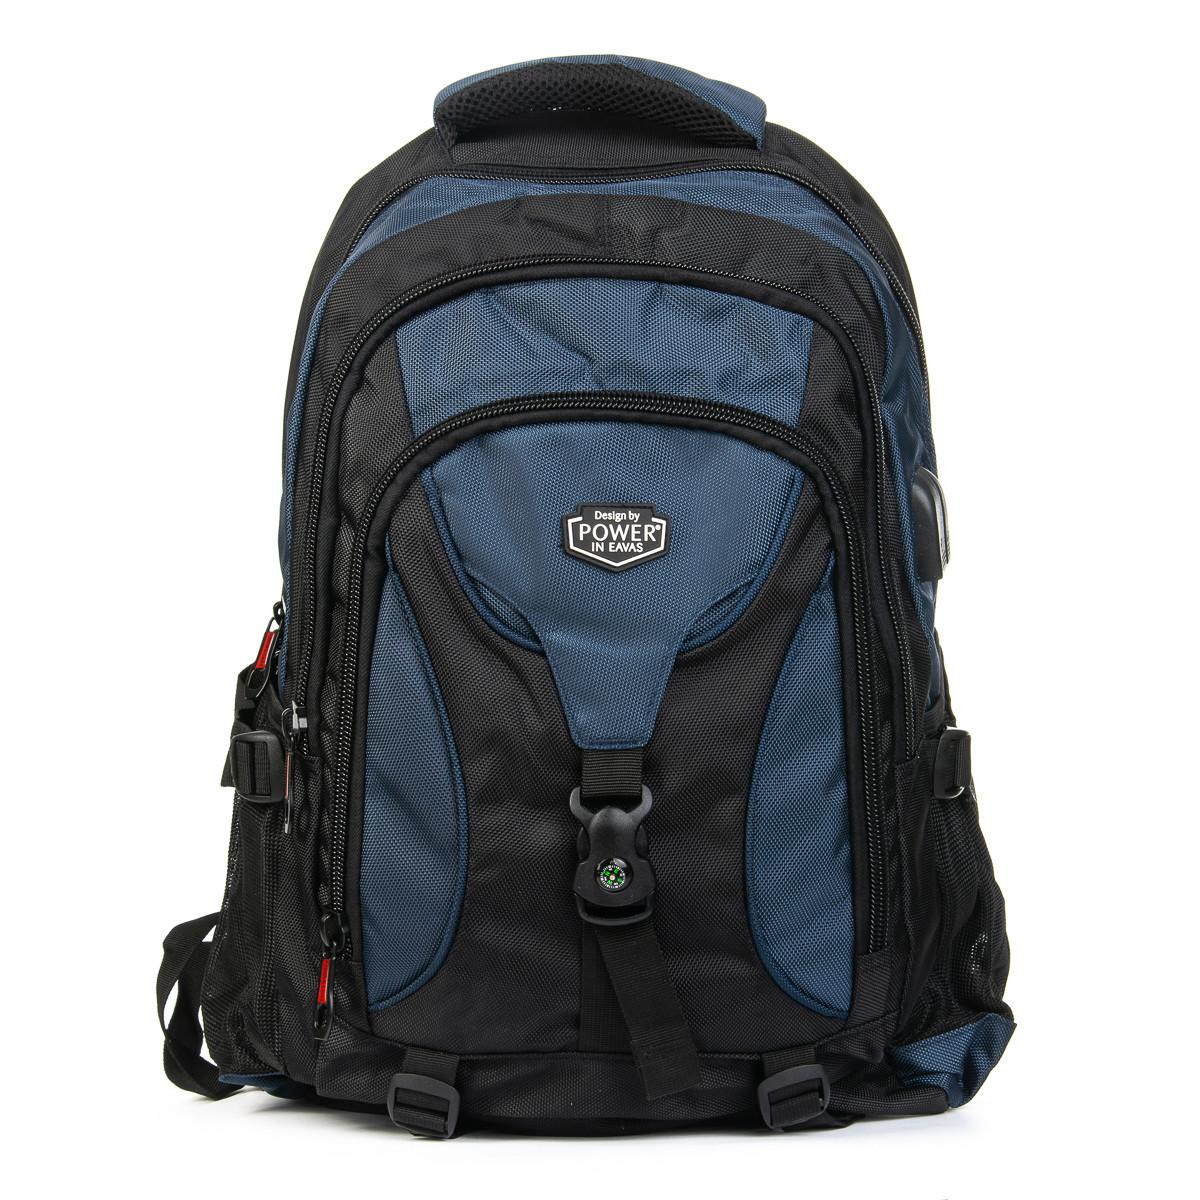 Рюкзак Городской нейлон Power In Eavas 8210 black-blue